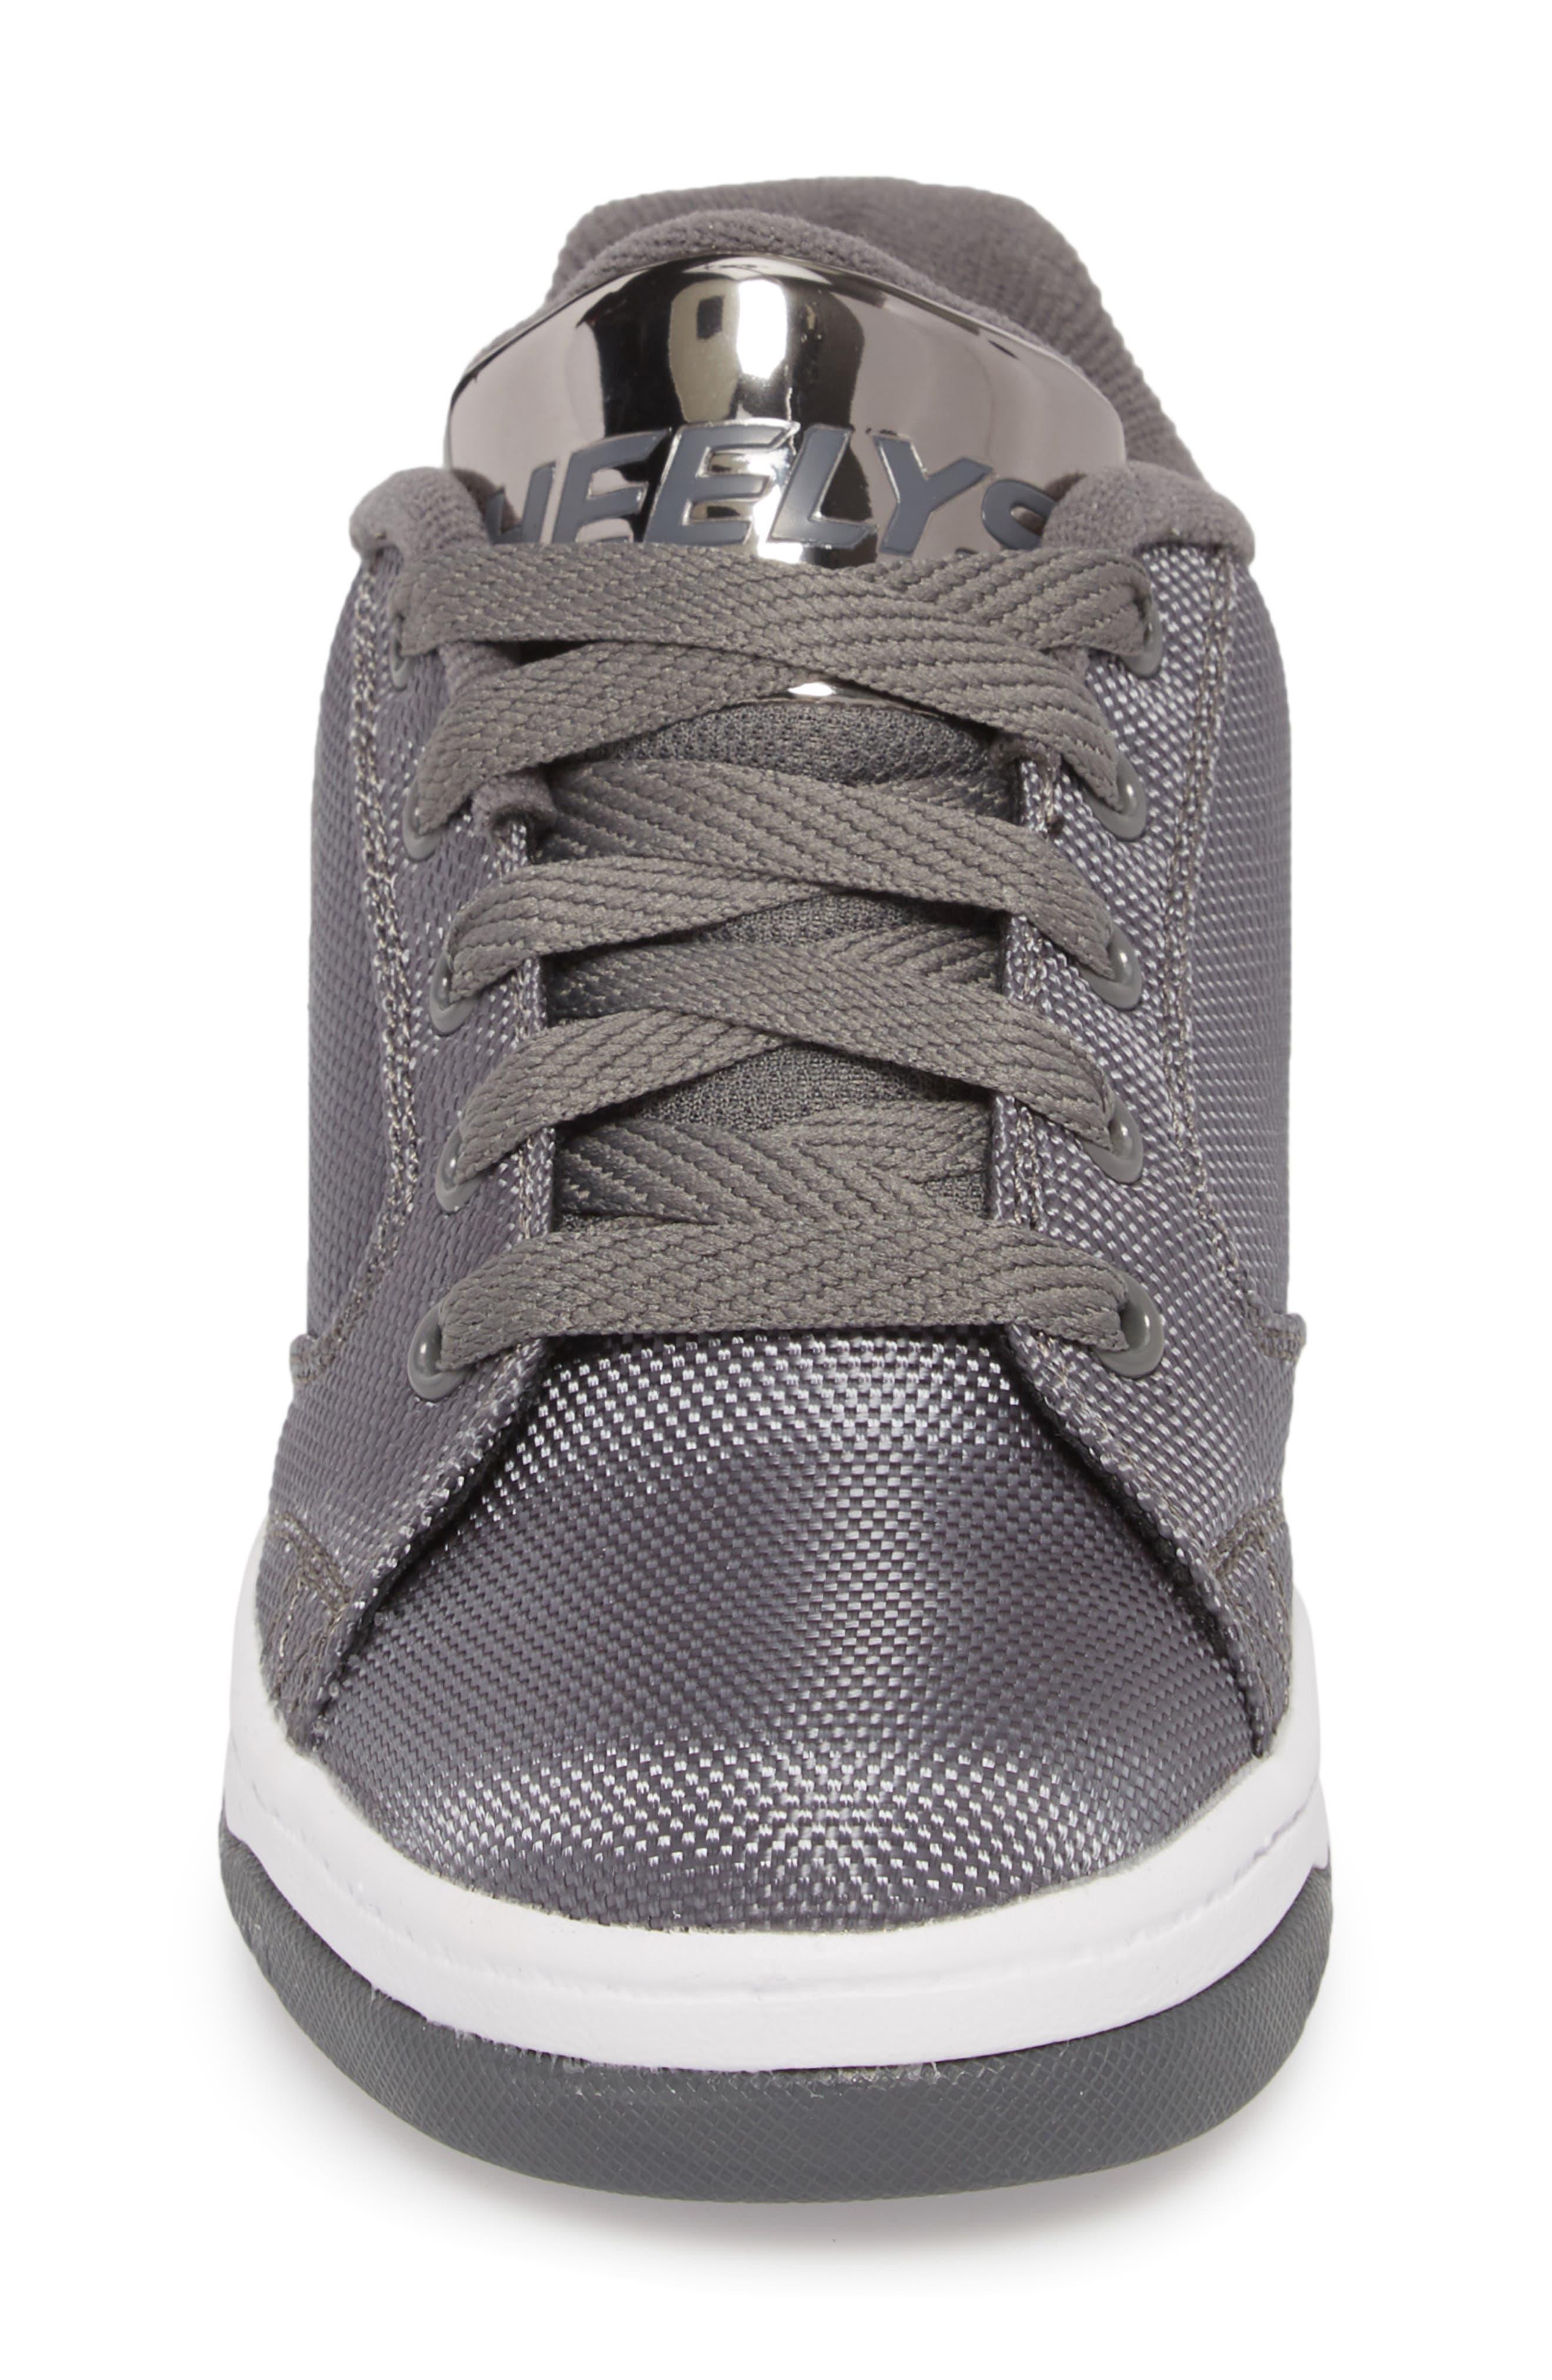 Heels Propel Ballistic Sneaker,                             Alternate thumbnail 4, color,                             Charcoal/ Pewter